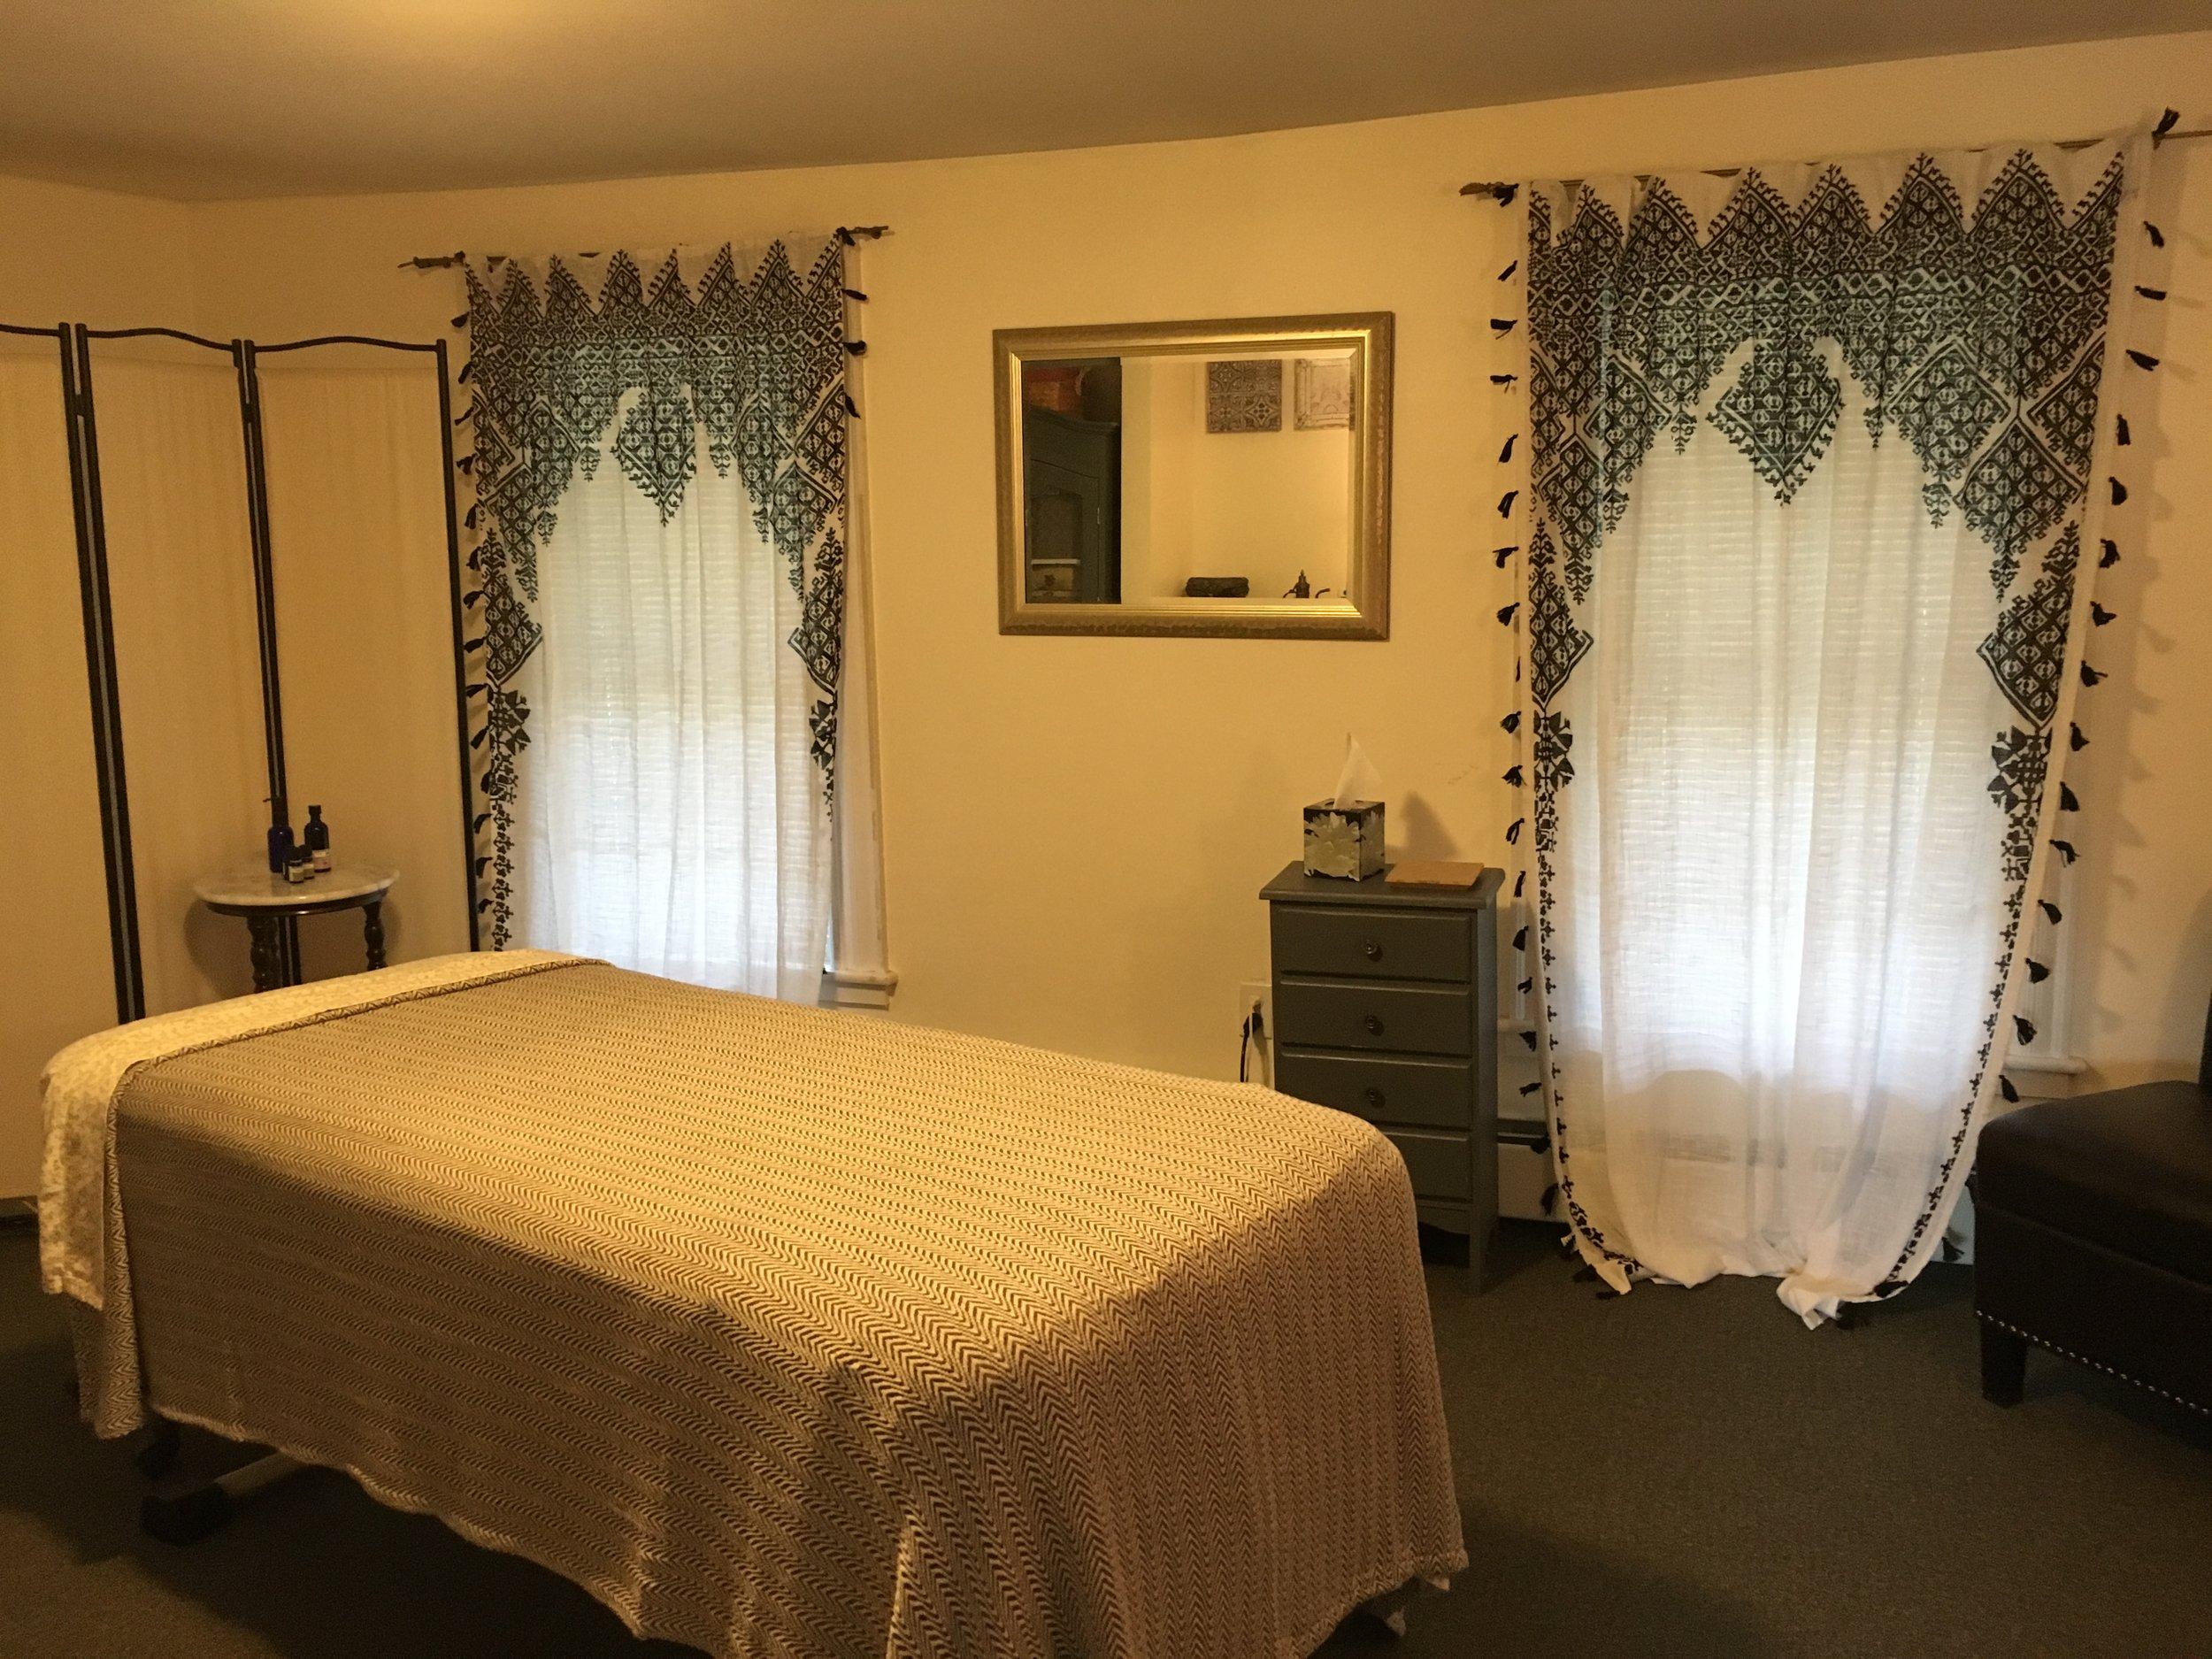 kk_remedies_massage_room2.JPG